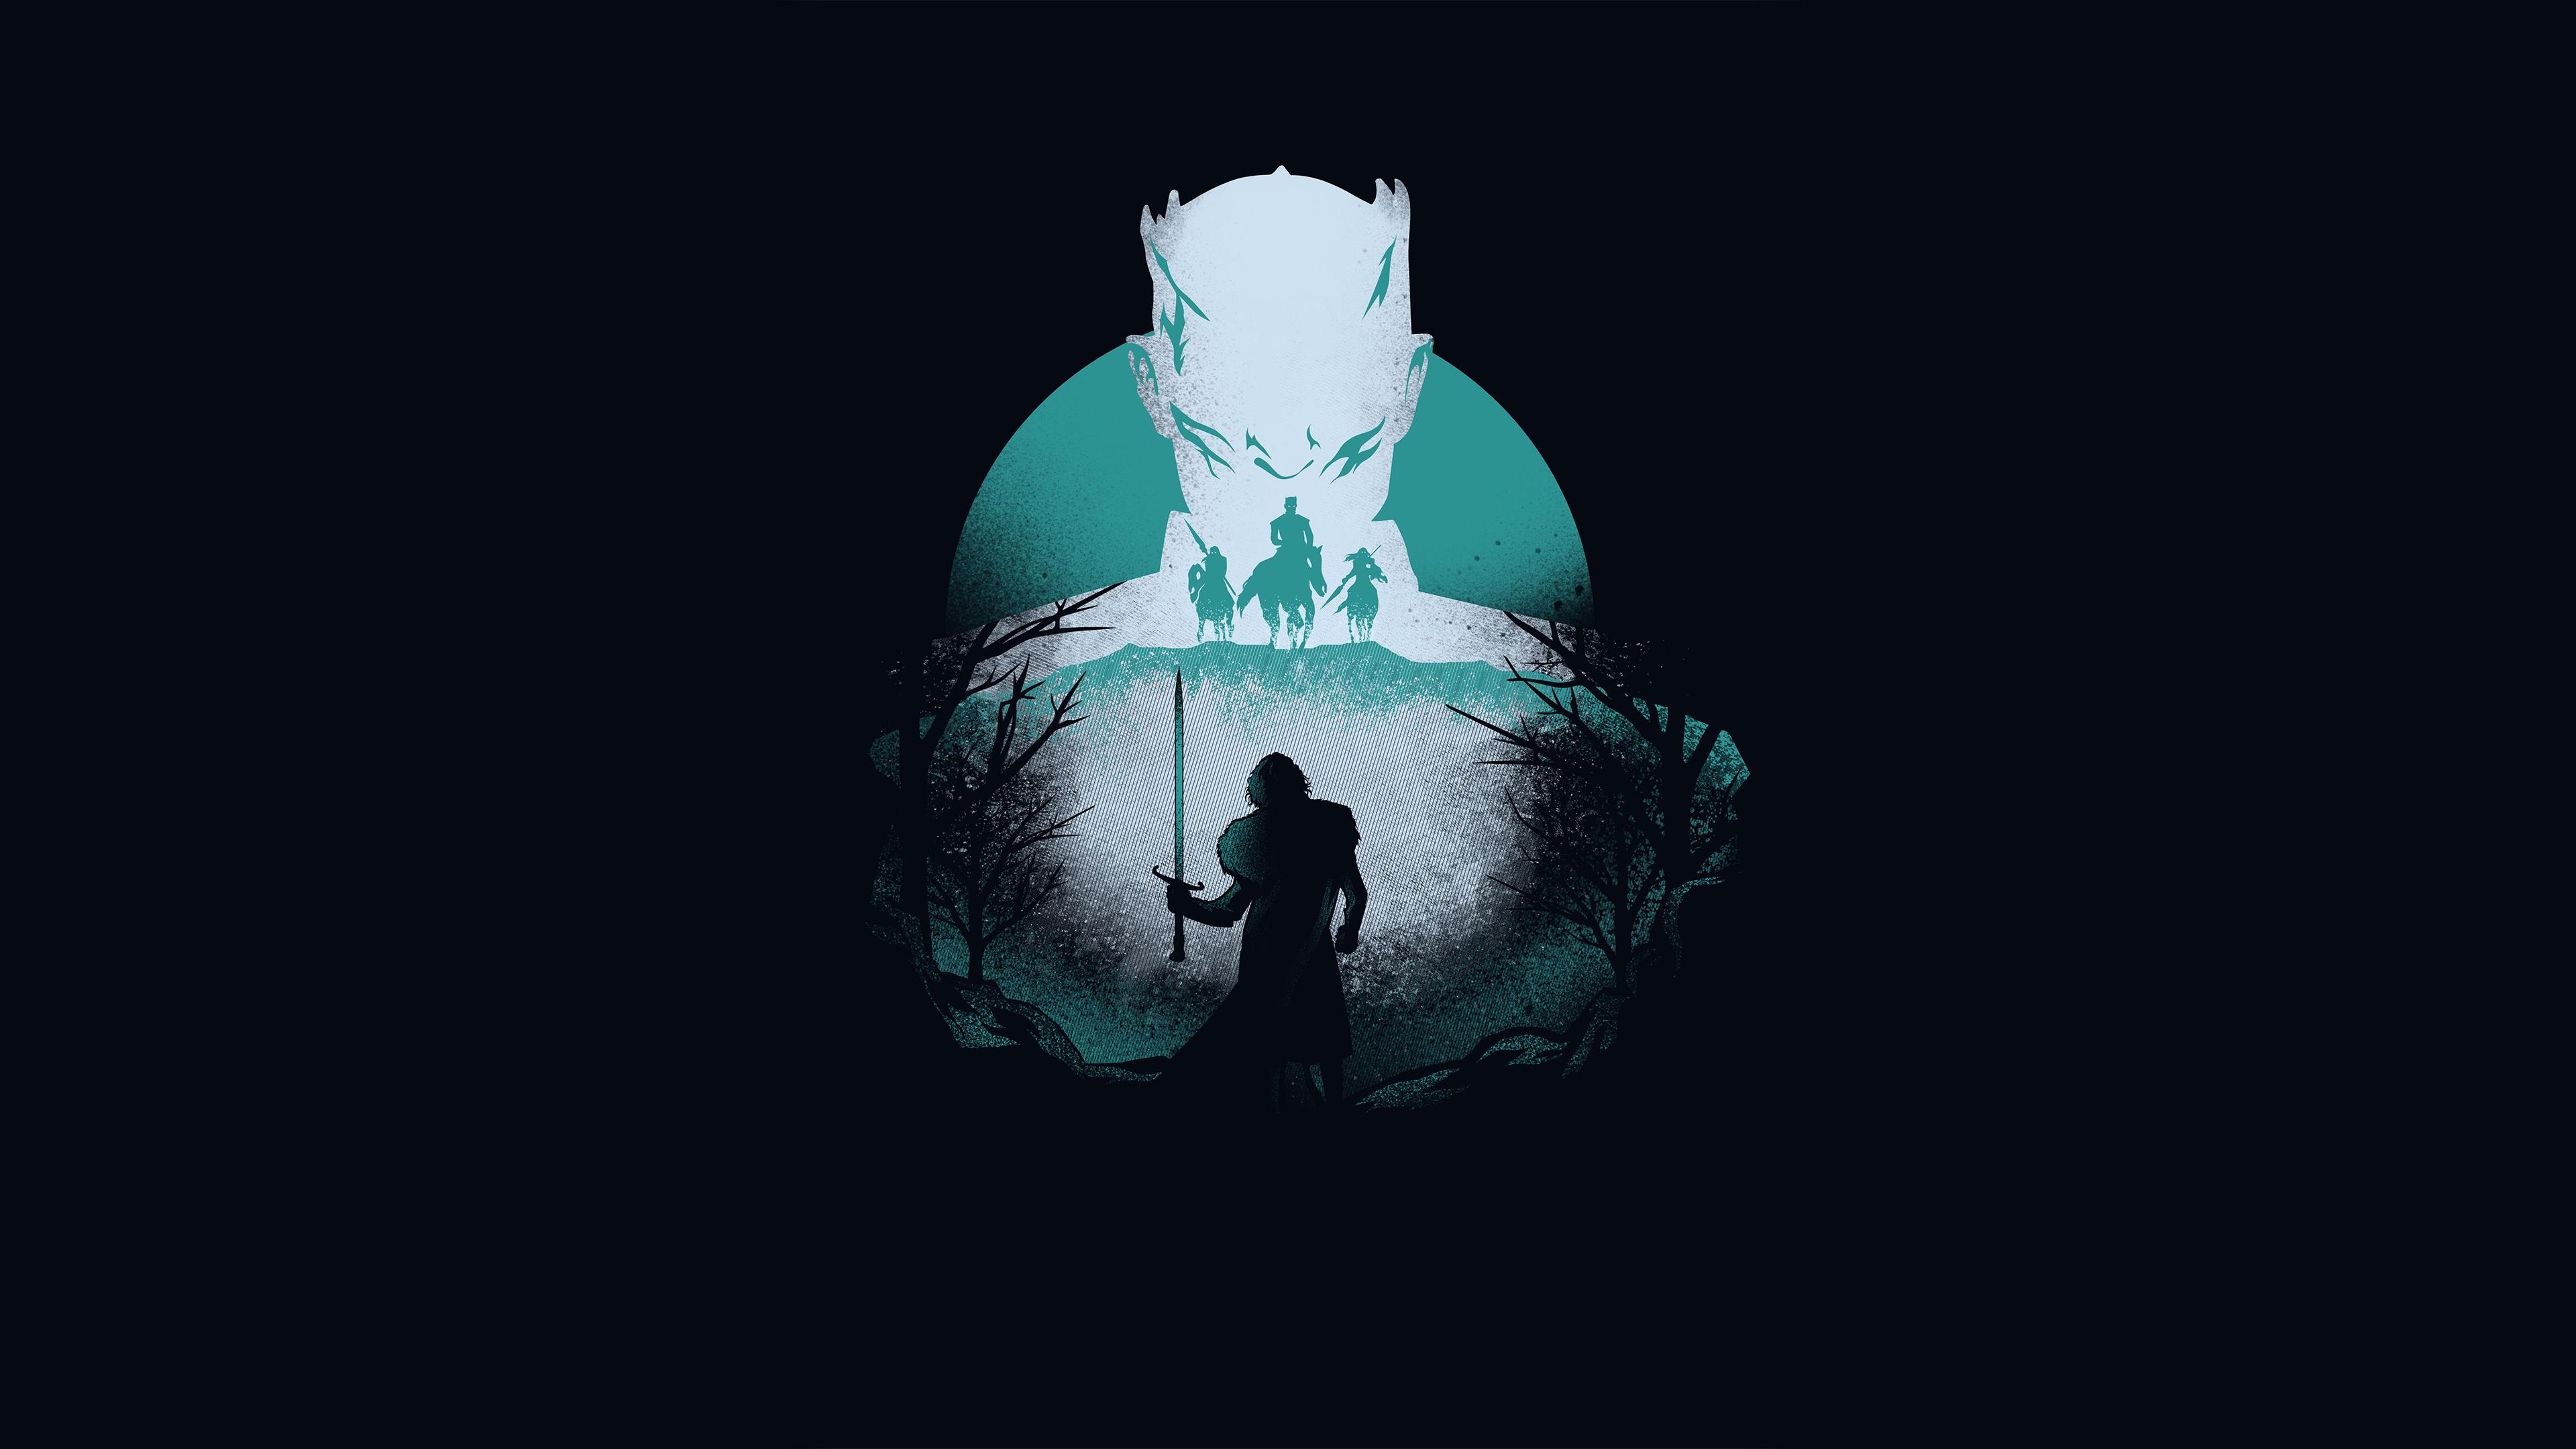 Обои background, tv series, daenerys targaryen, vintage, Game of thrones, minimalism, pinup models, Pinup, dragon, fantasy. Минимализм foto 16